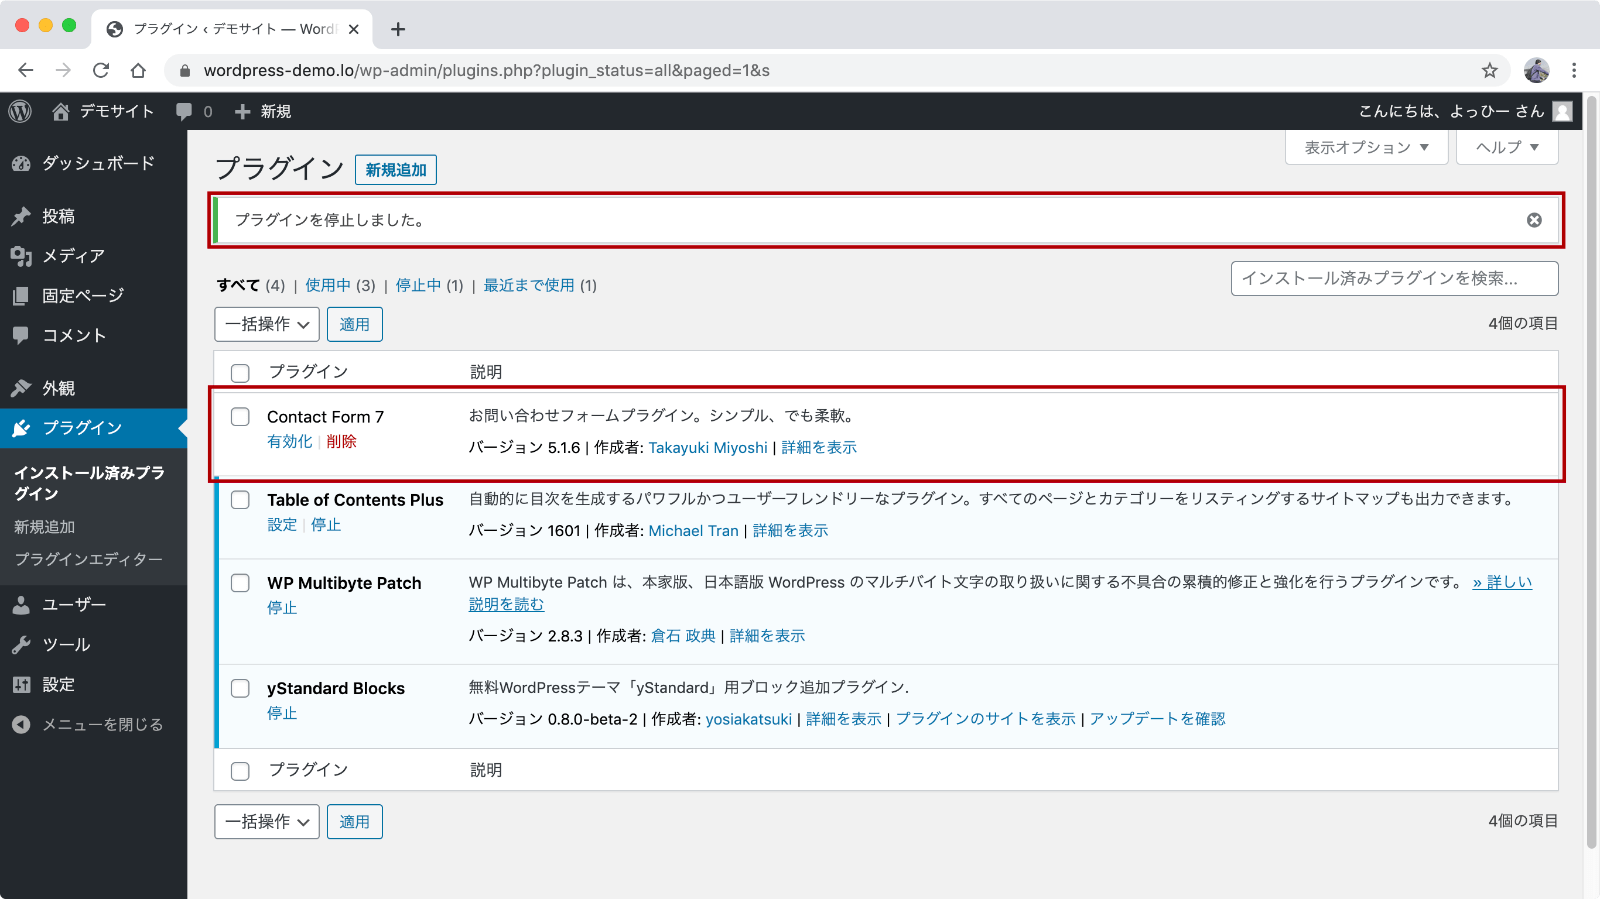 WordPressプラグインを停止した図